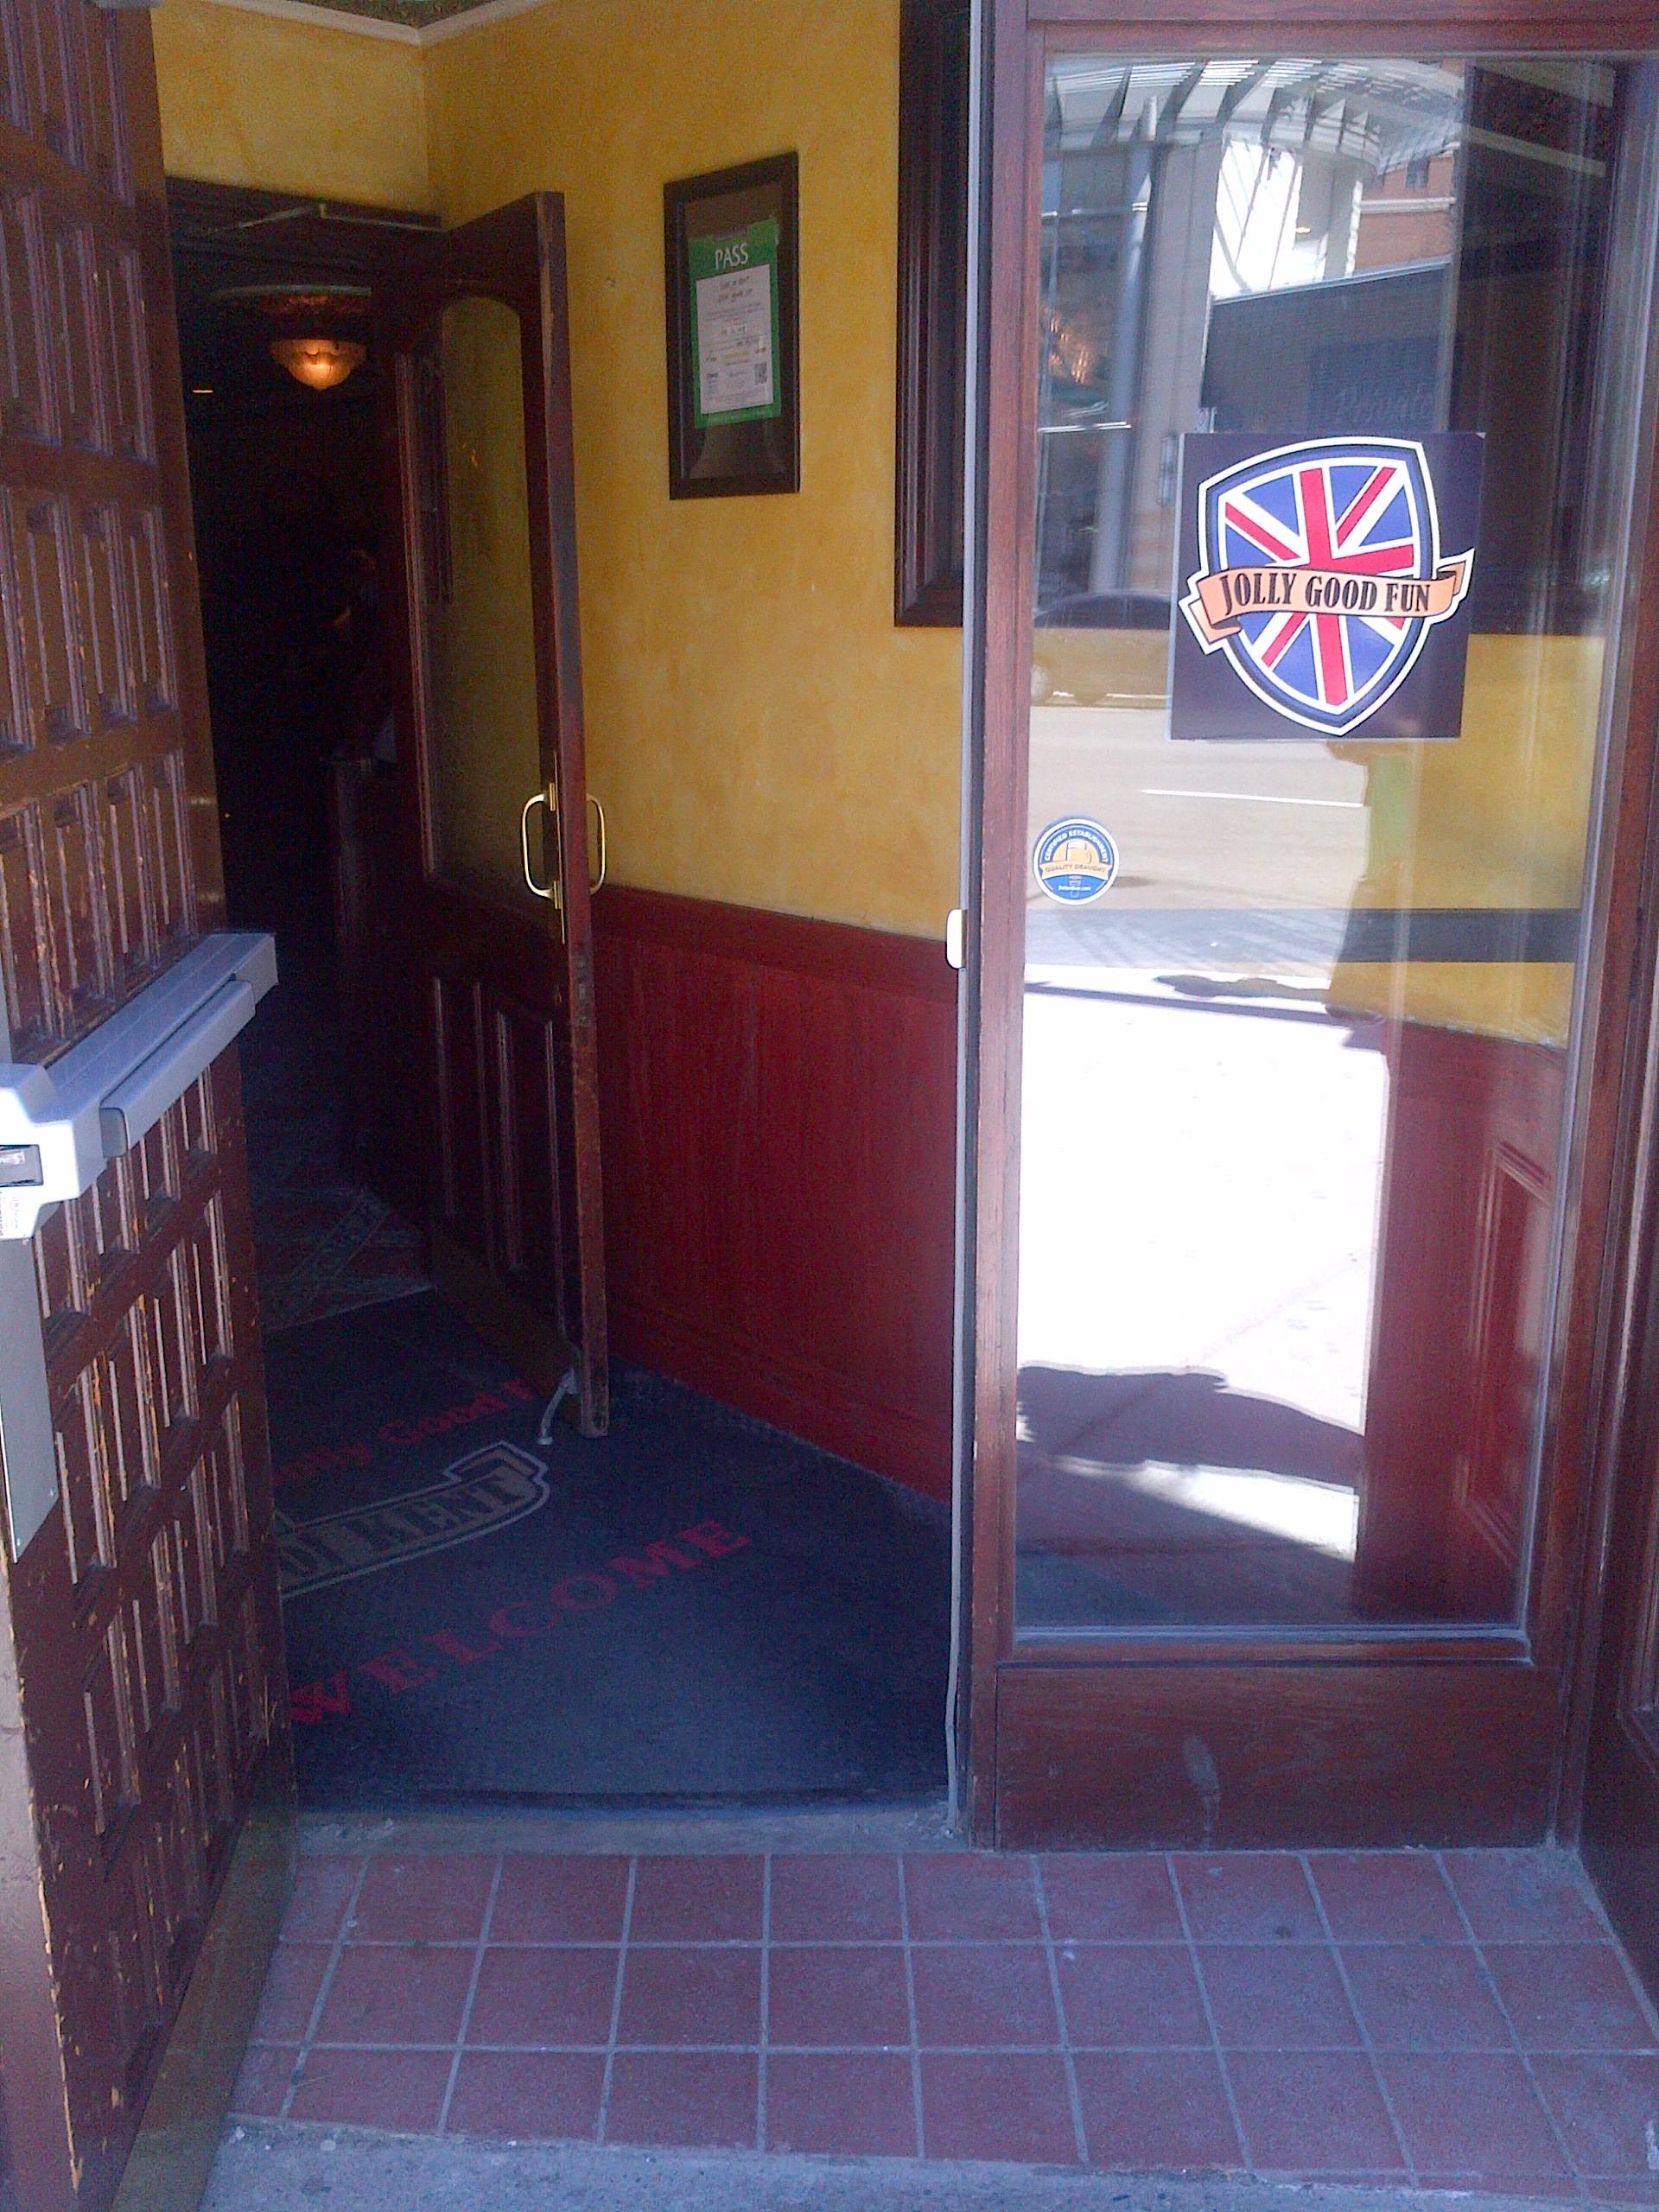 Picture of accessible doorway.